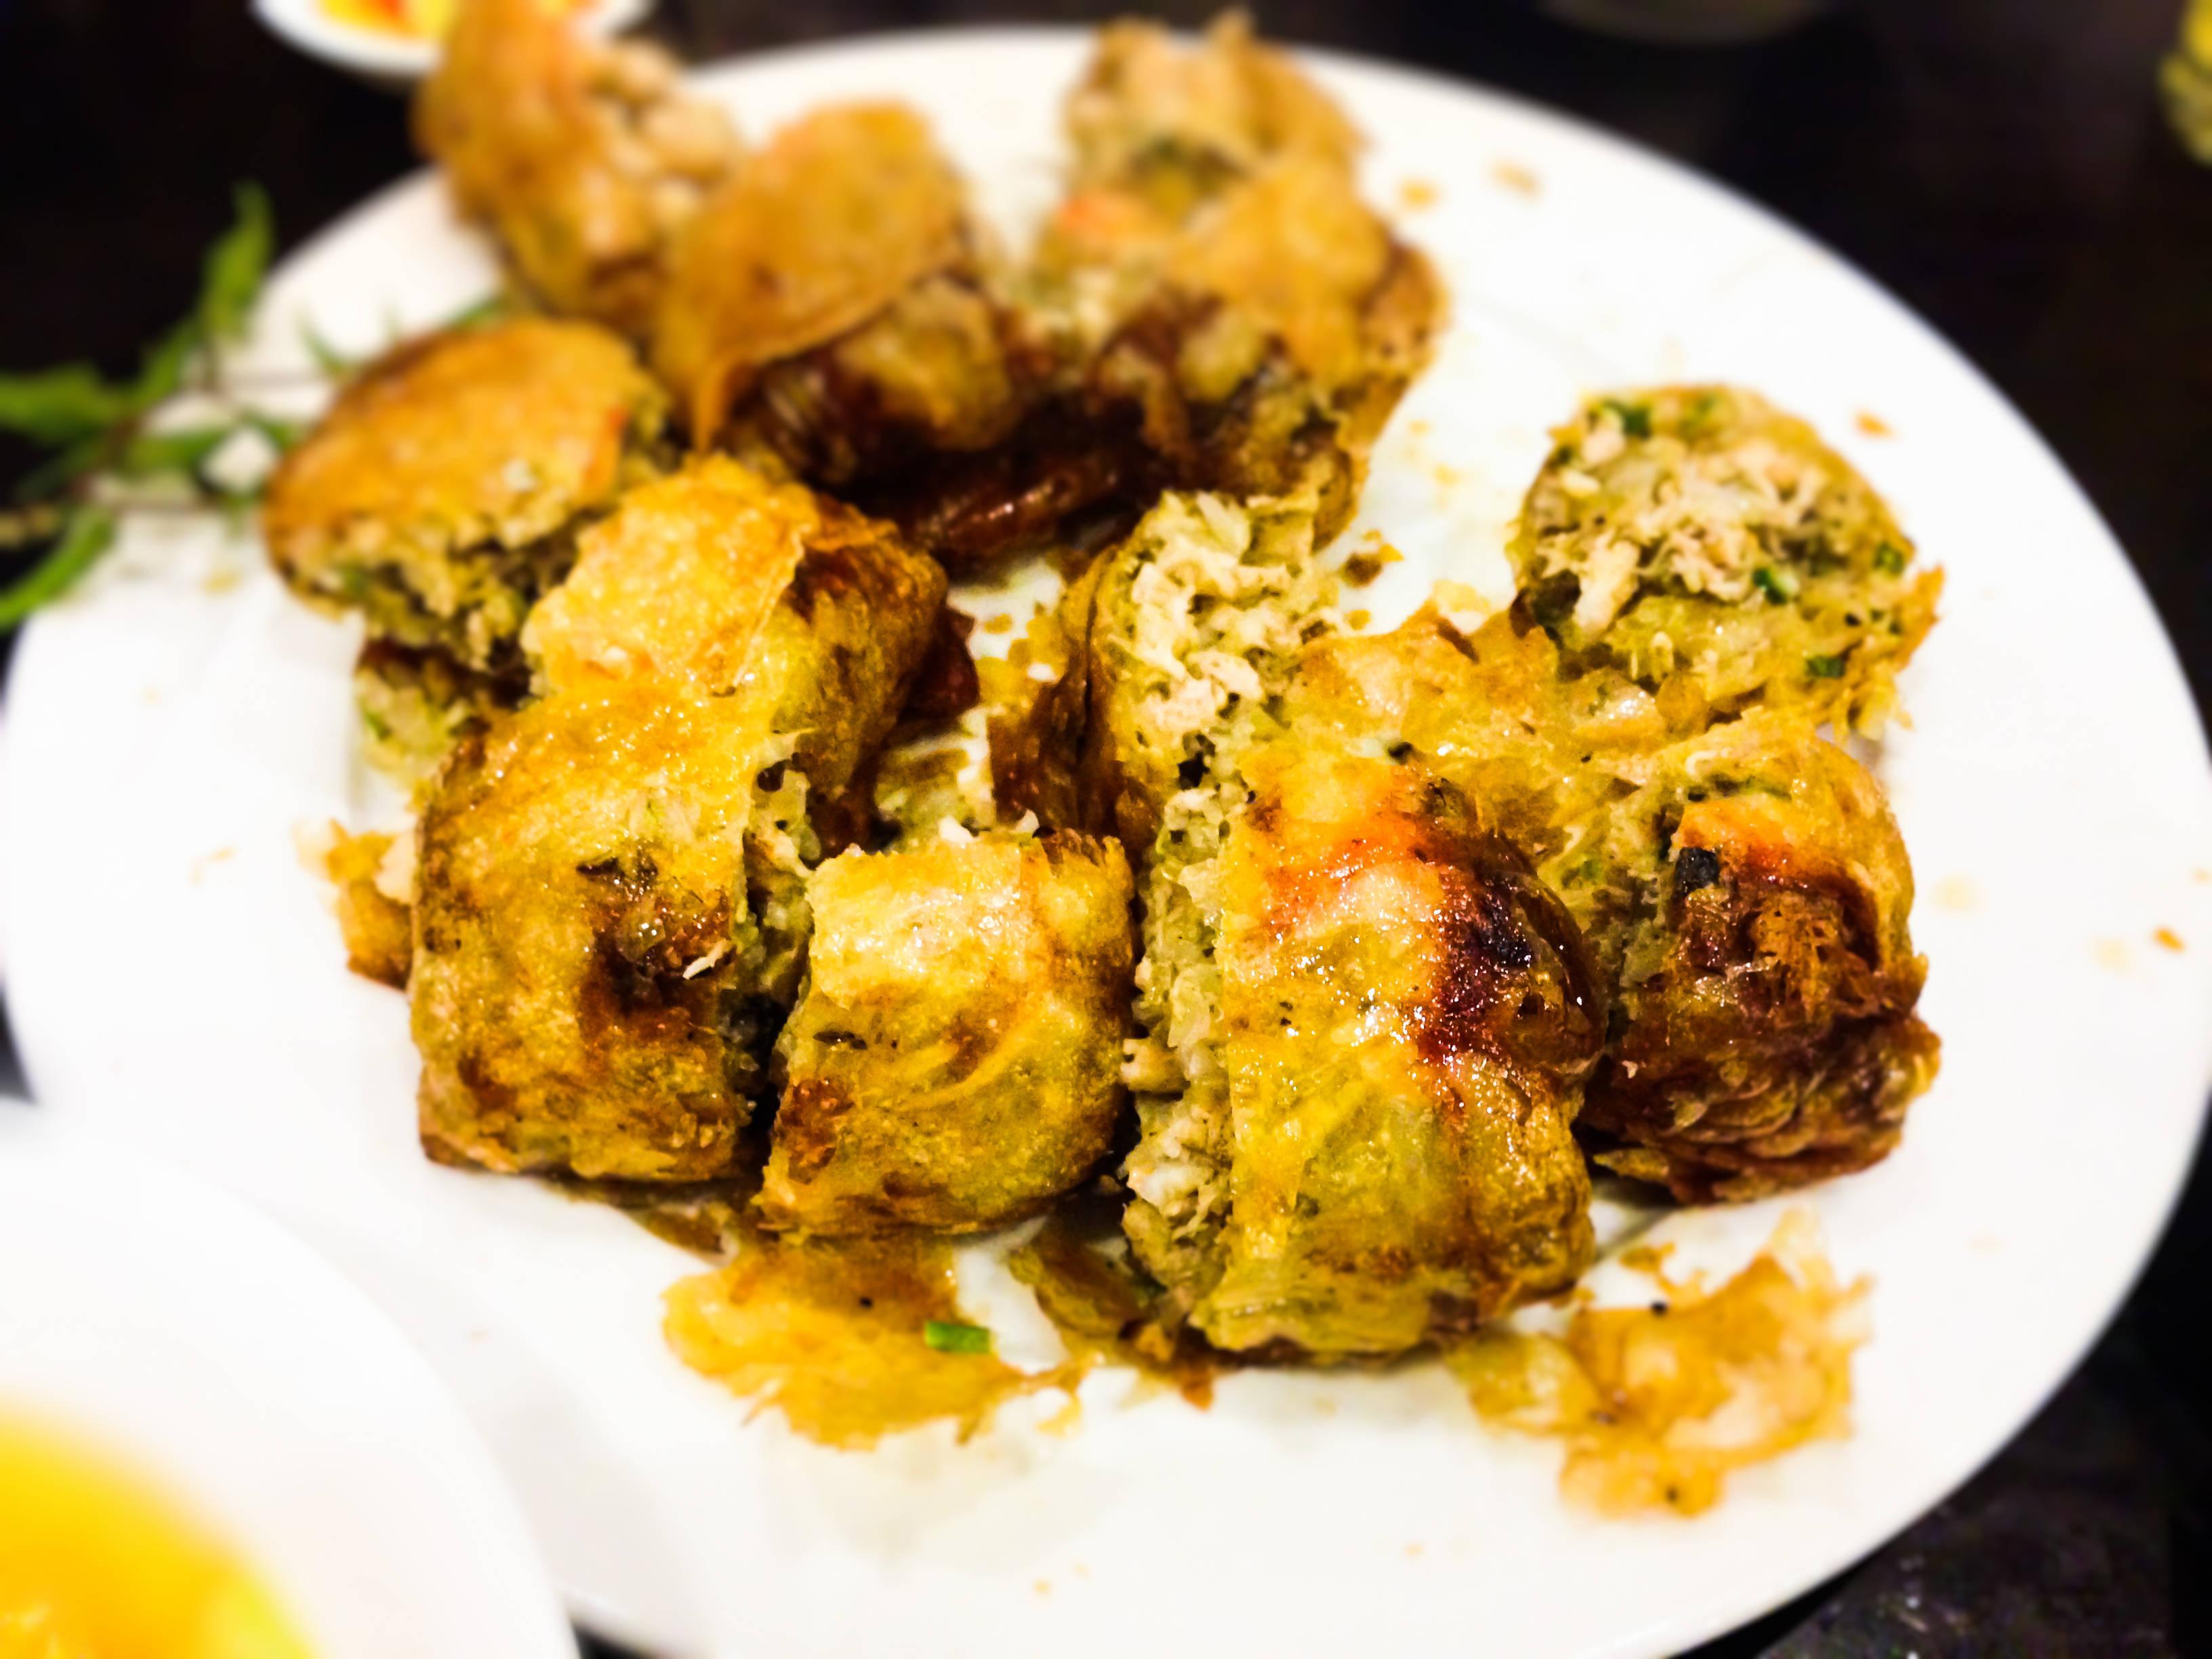 Fried sea crab spring rolls